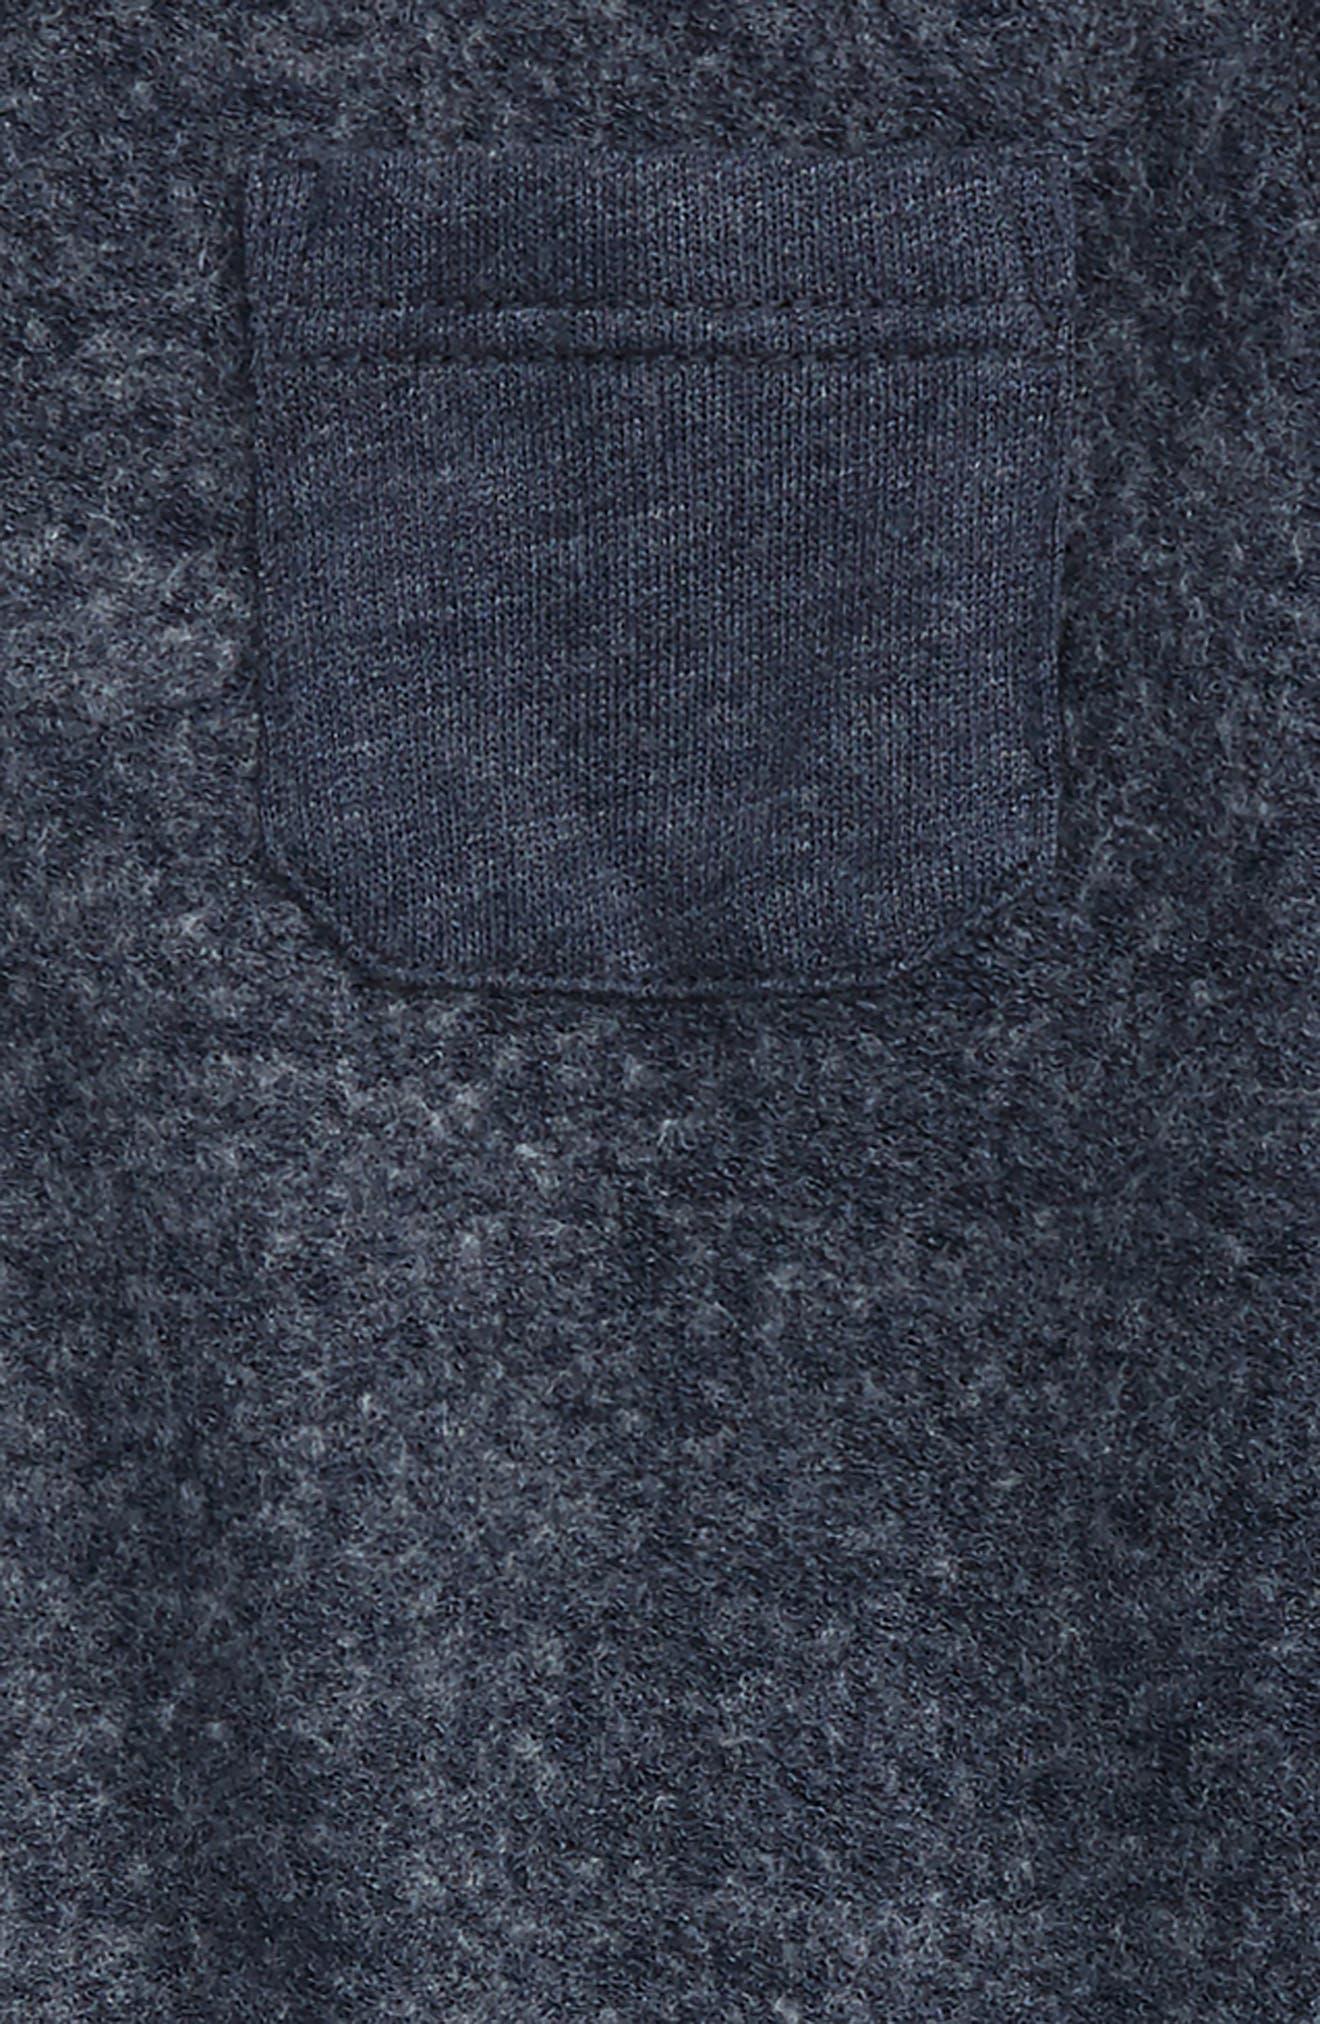 Alternate Image 2  - Tucker + Tate Fleece Sweatshirt (Toddler Boys & Little Boys)